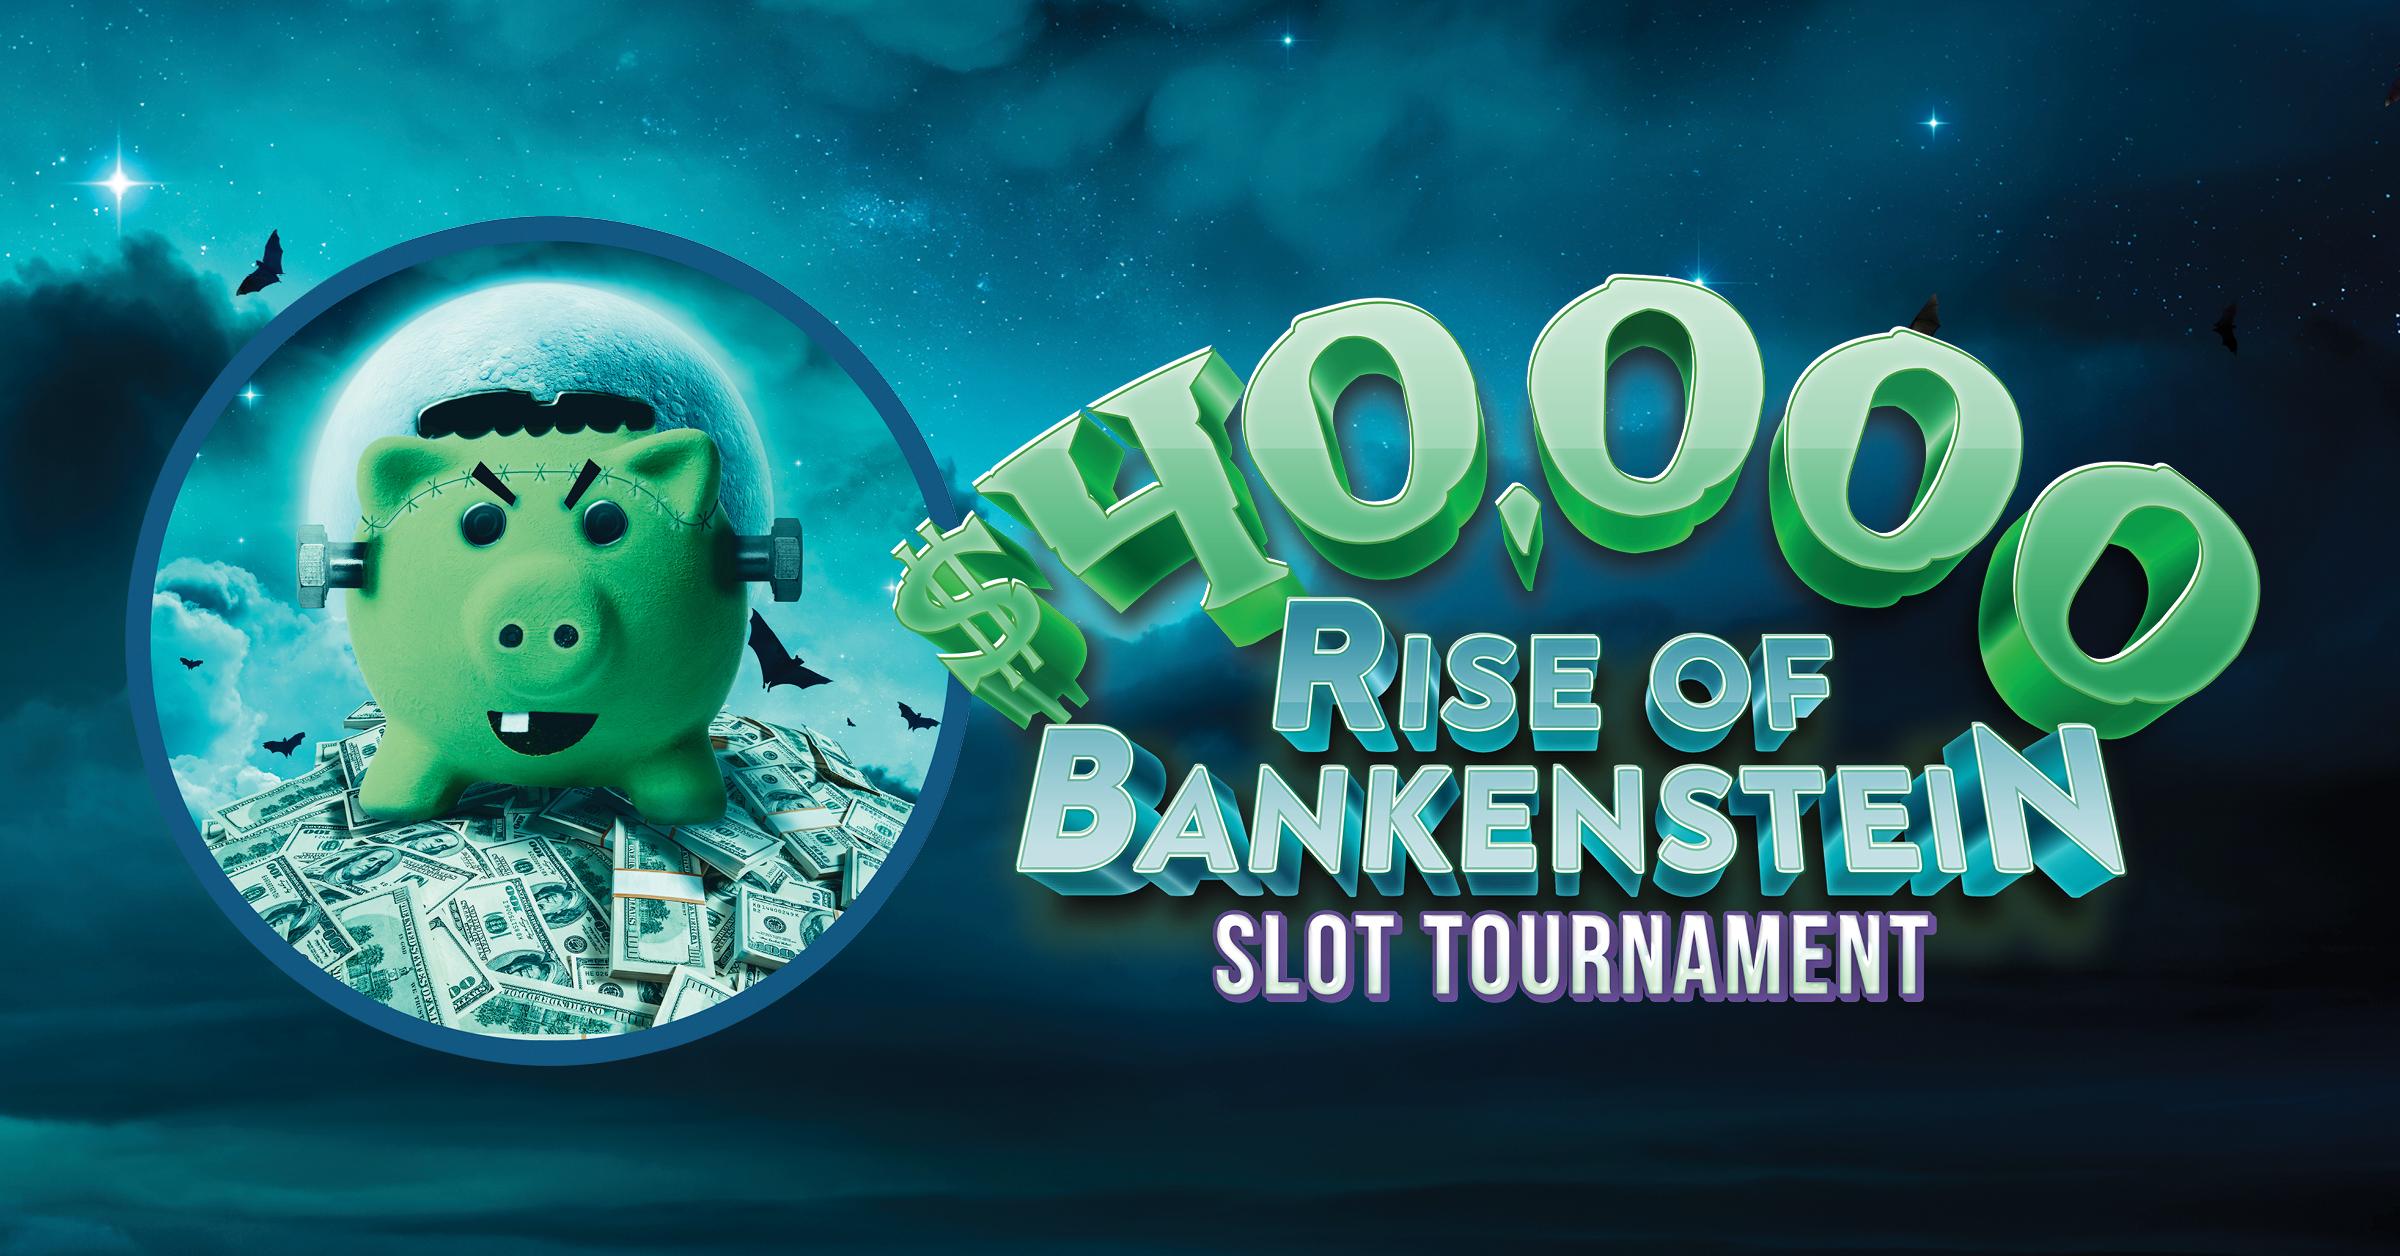 Rise of Bankenstein Slot Tournament